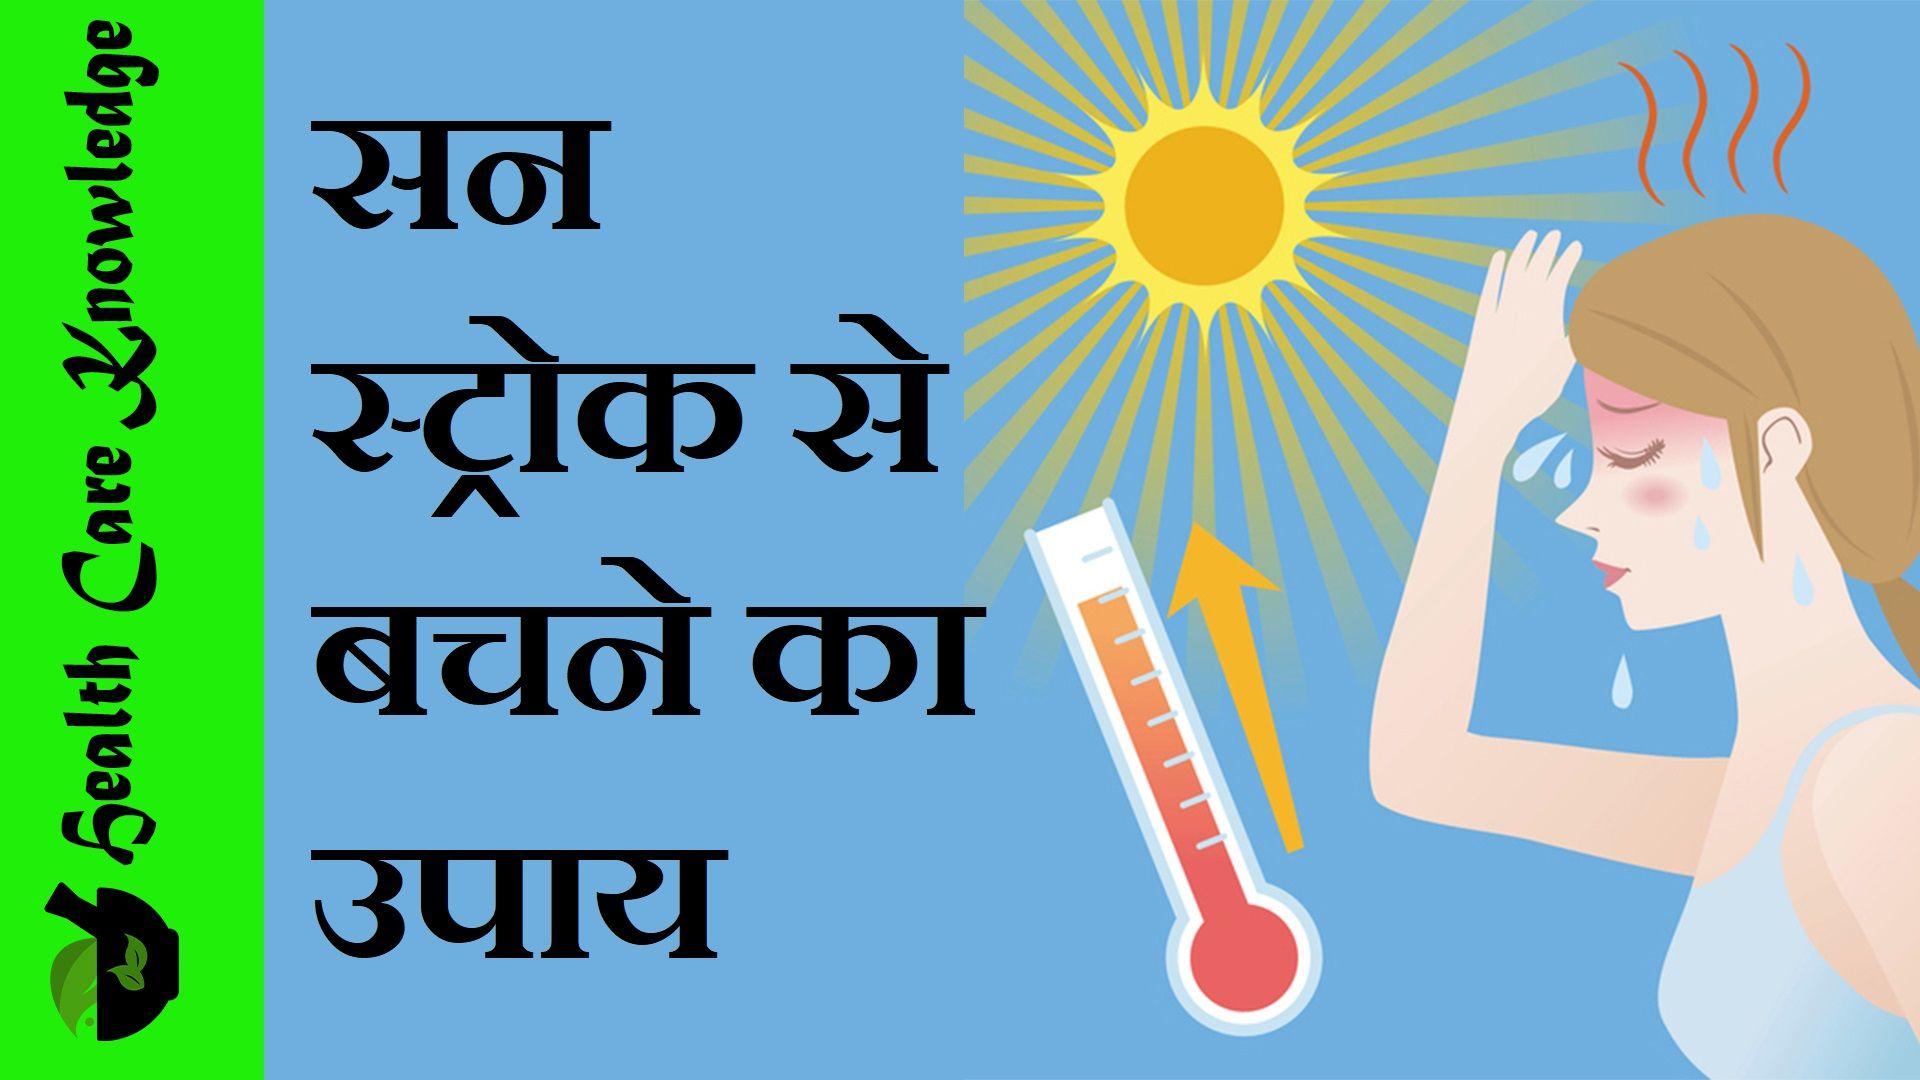 लू लगने के लक्षण, कारण, इलाज    Heat